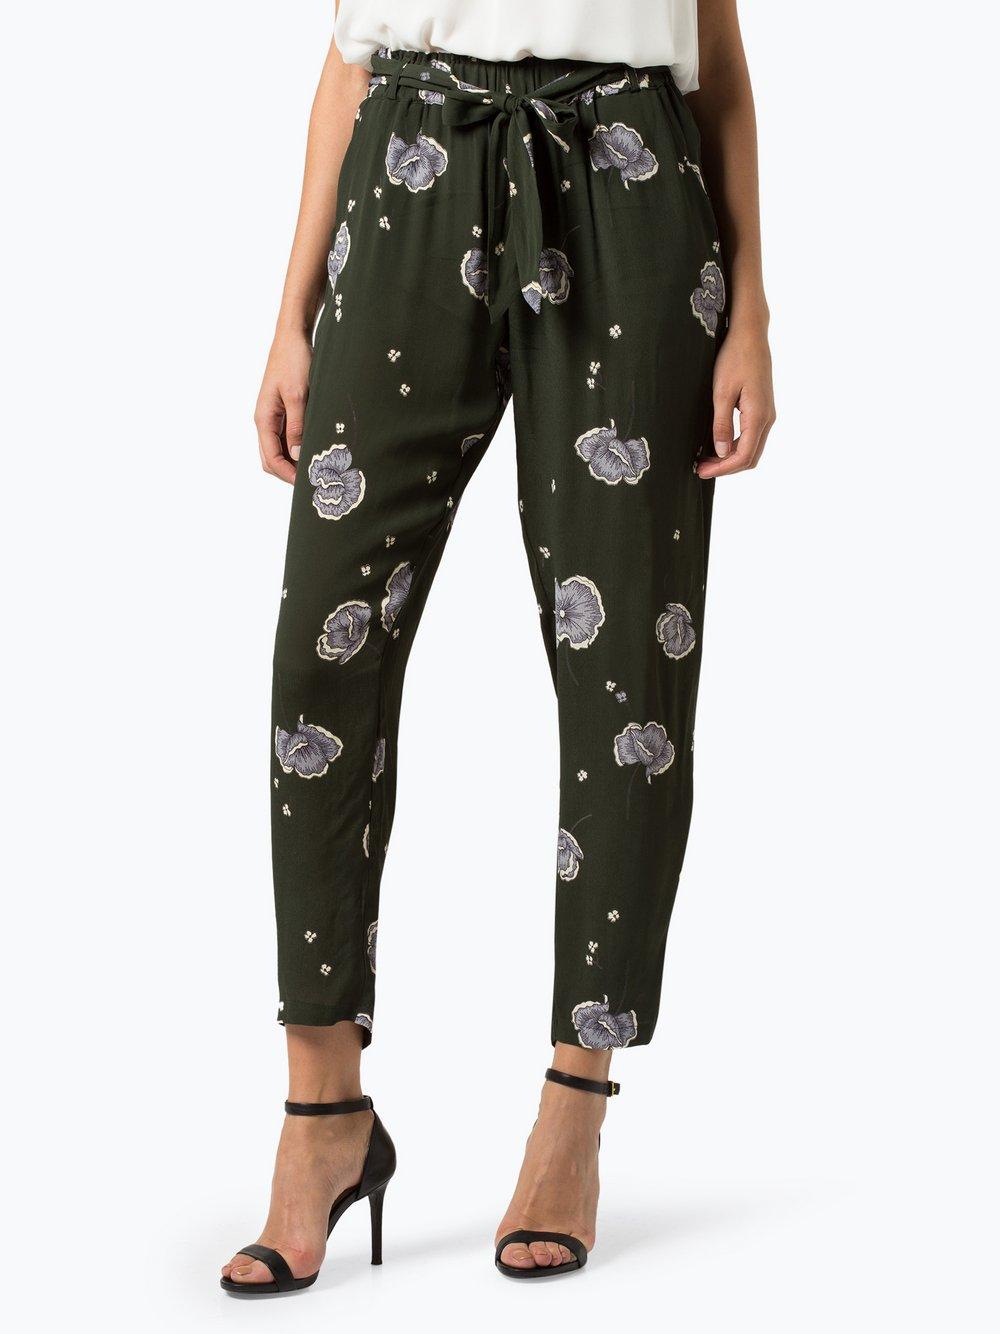 Minimum – Spodnie damskie – Roseanna, zielony Van Graaf 406726-0001